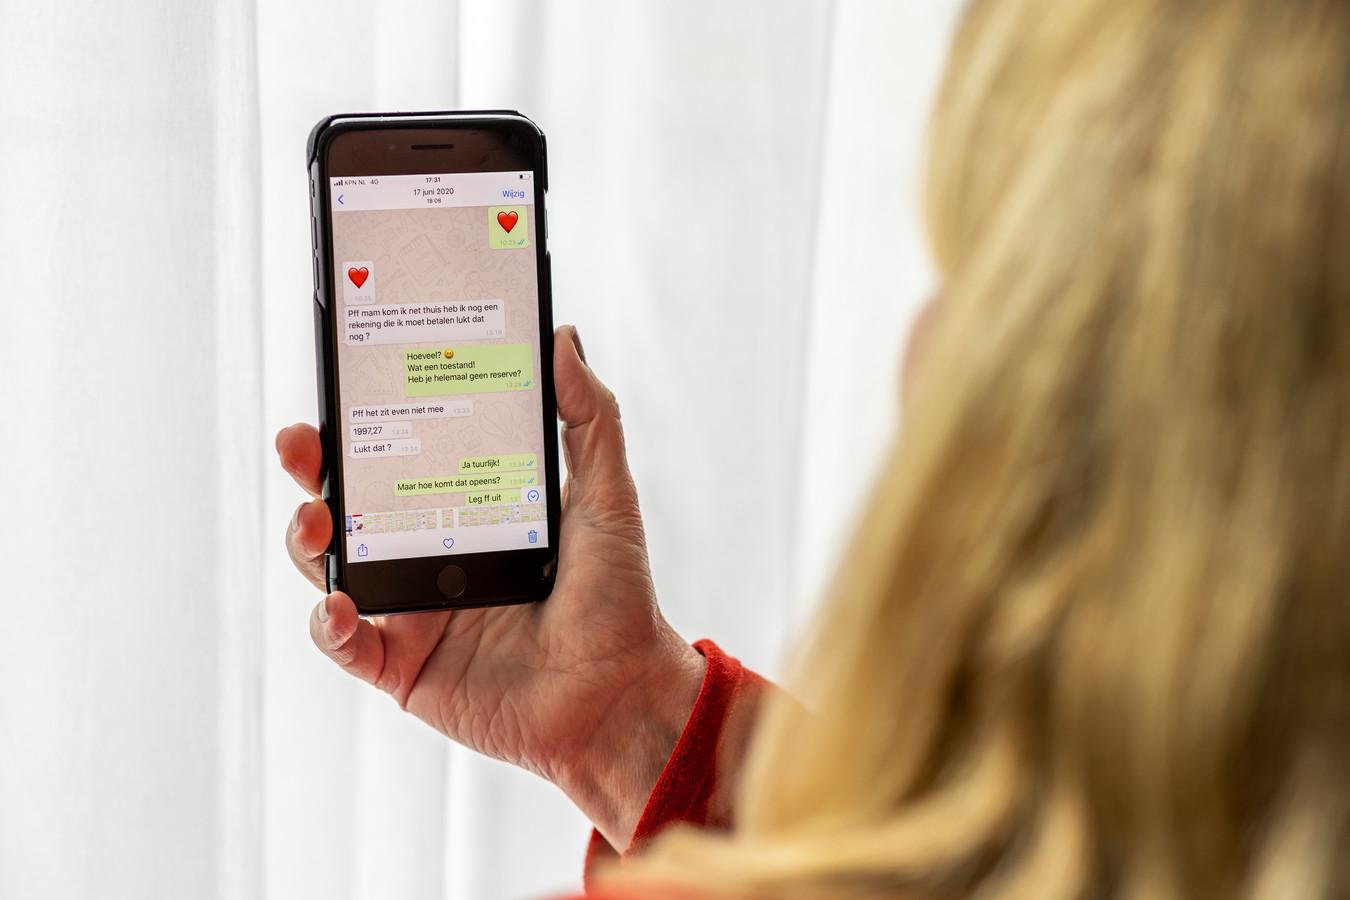 WhatsApp-fraude neemt enorm toe, met gemiddeld 1500 euro schade per slachtoffer.